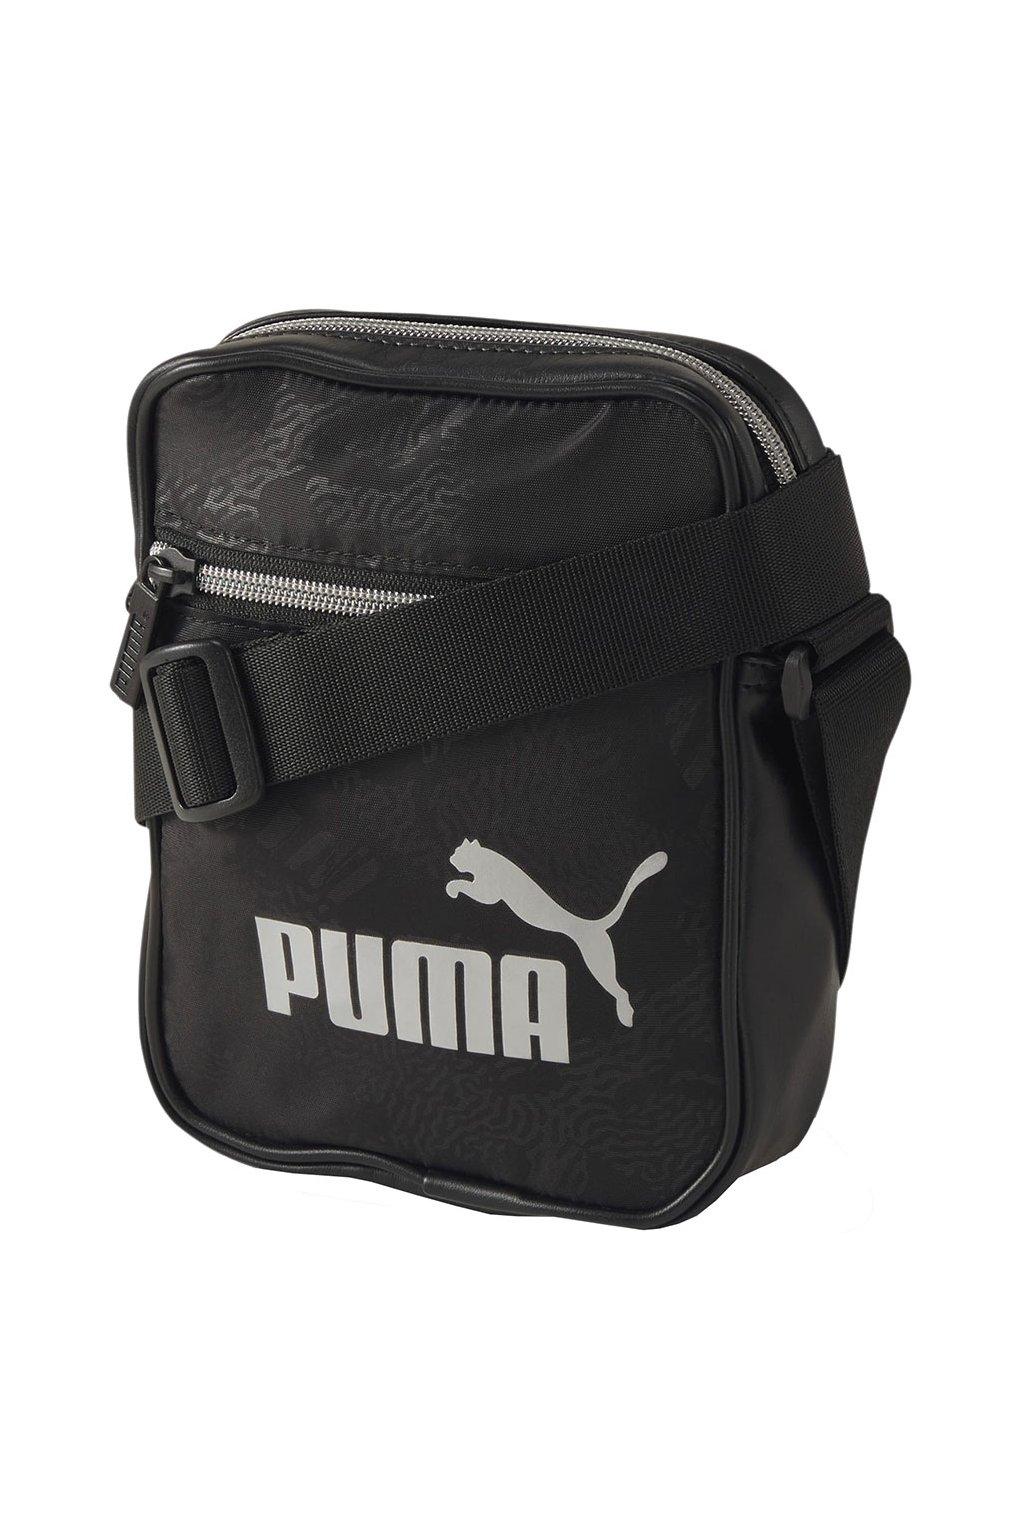 Taška Puma WMN Core up Portable čierna 076974 01